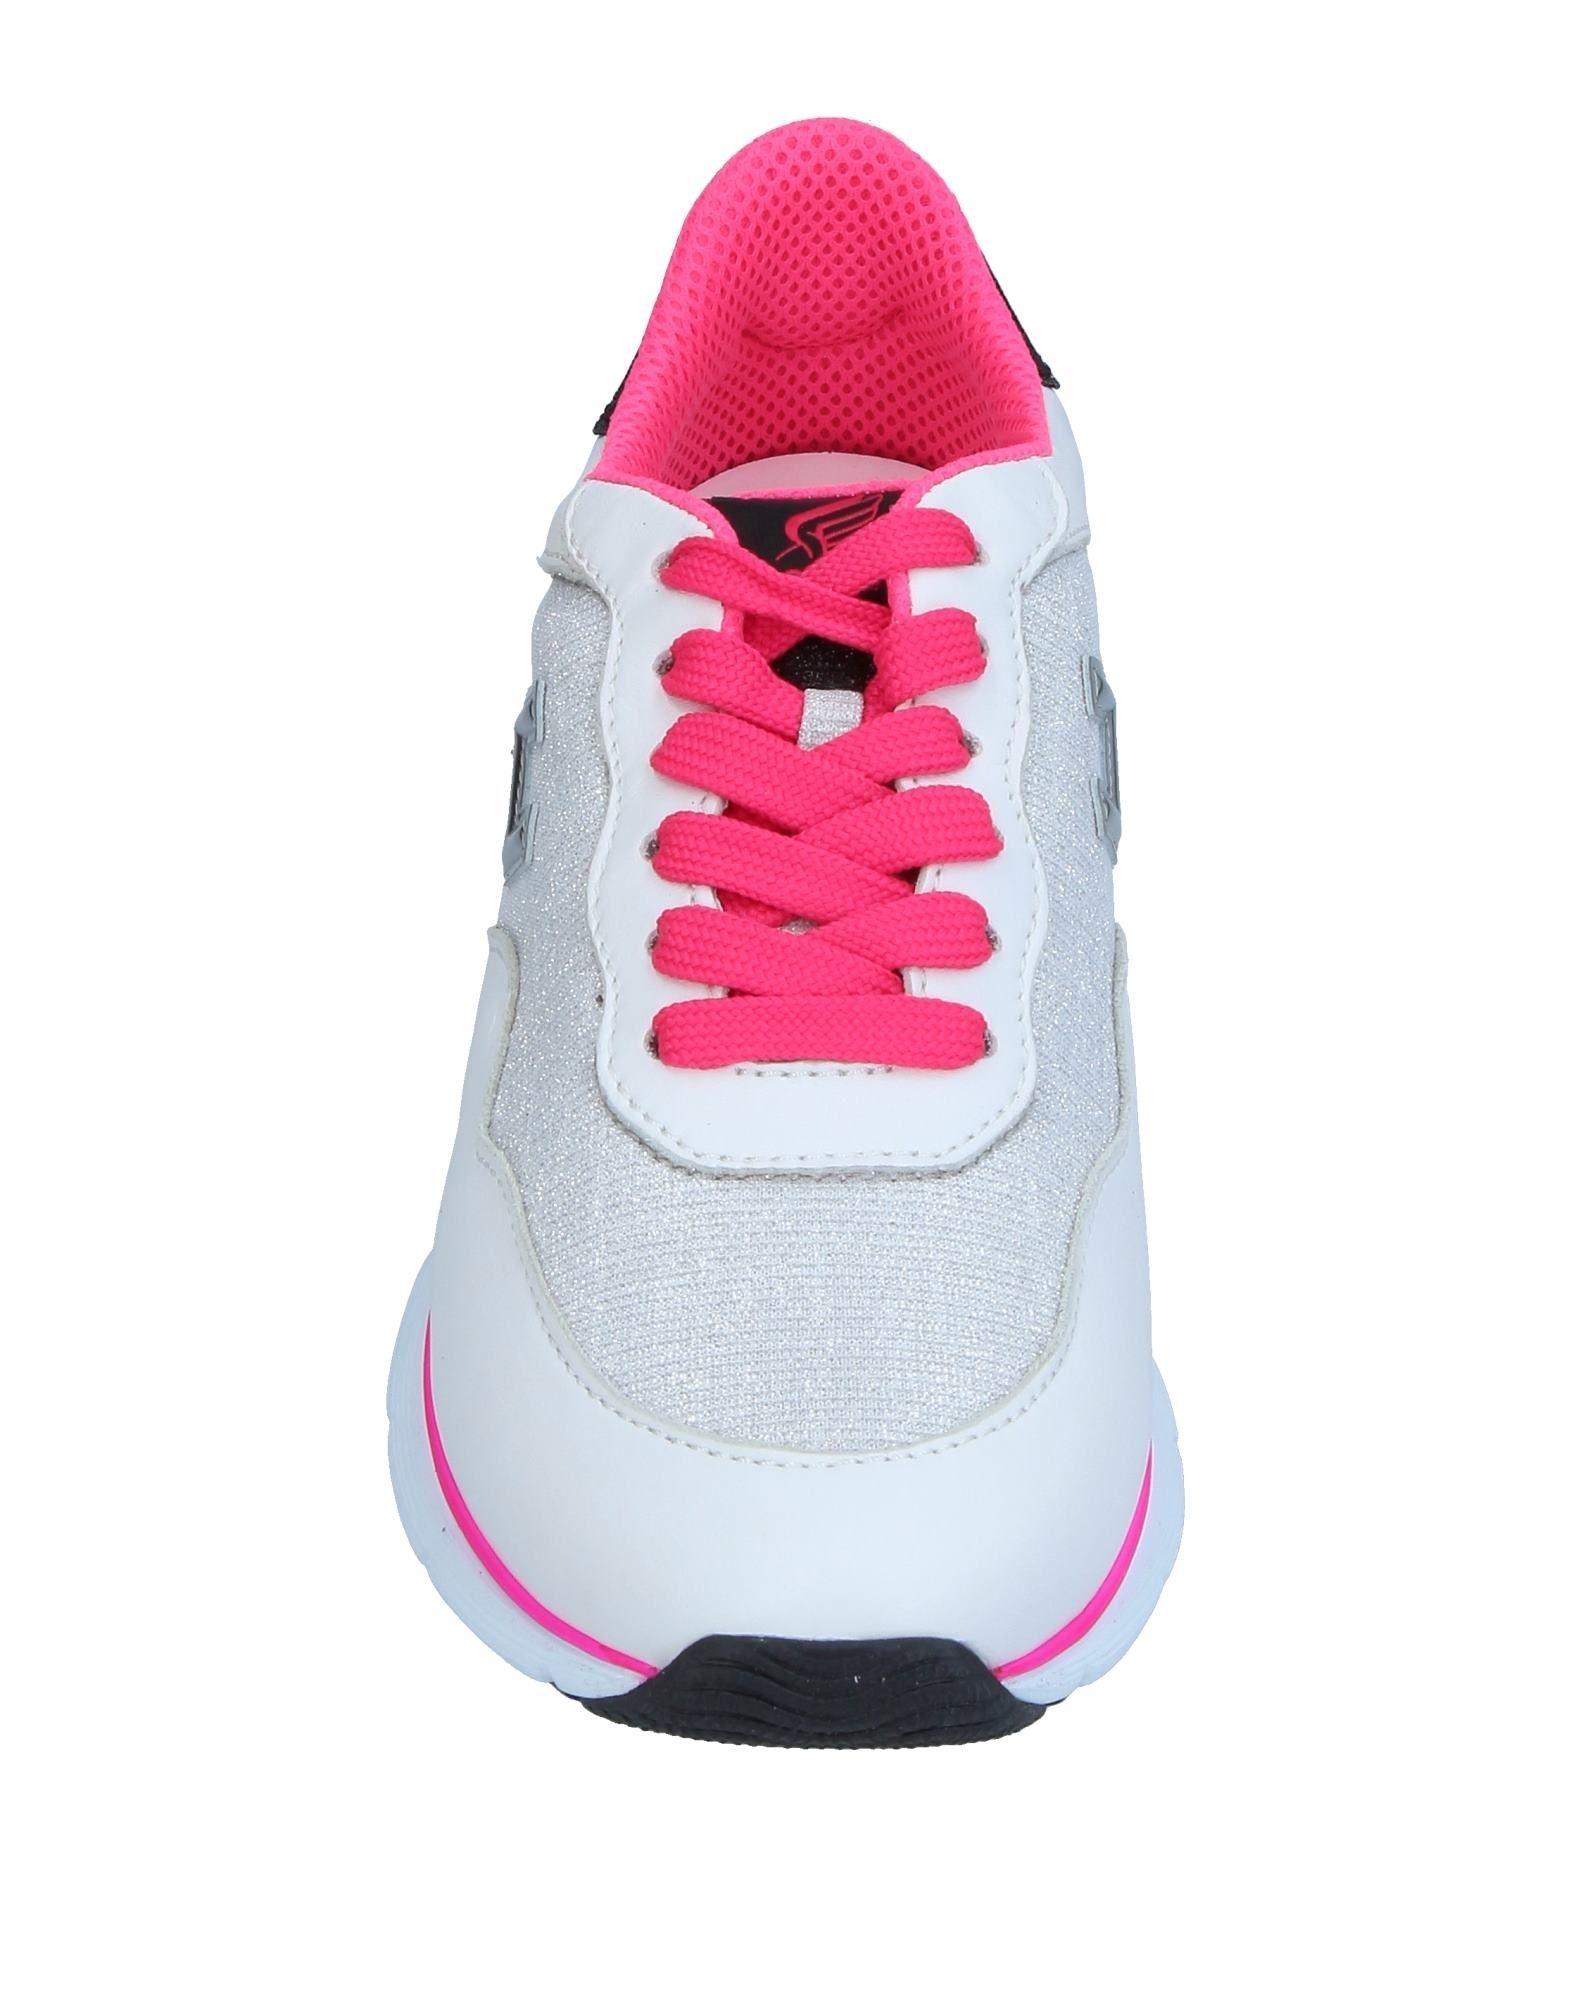 Hogan Sneakers Sneakers Sneakers - Women Hogan Sneakers online on  Canada - 11369674IL 58c7db